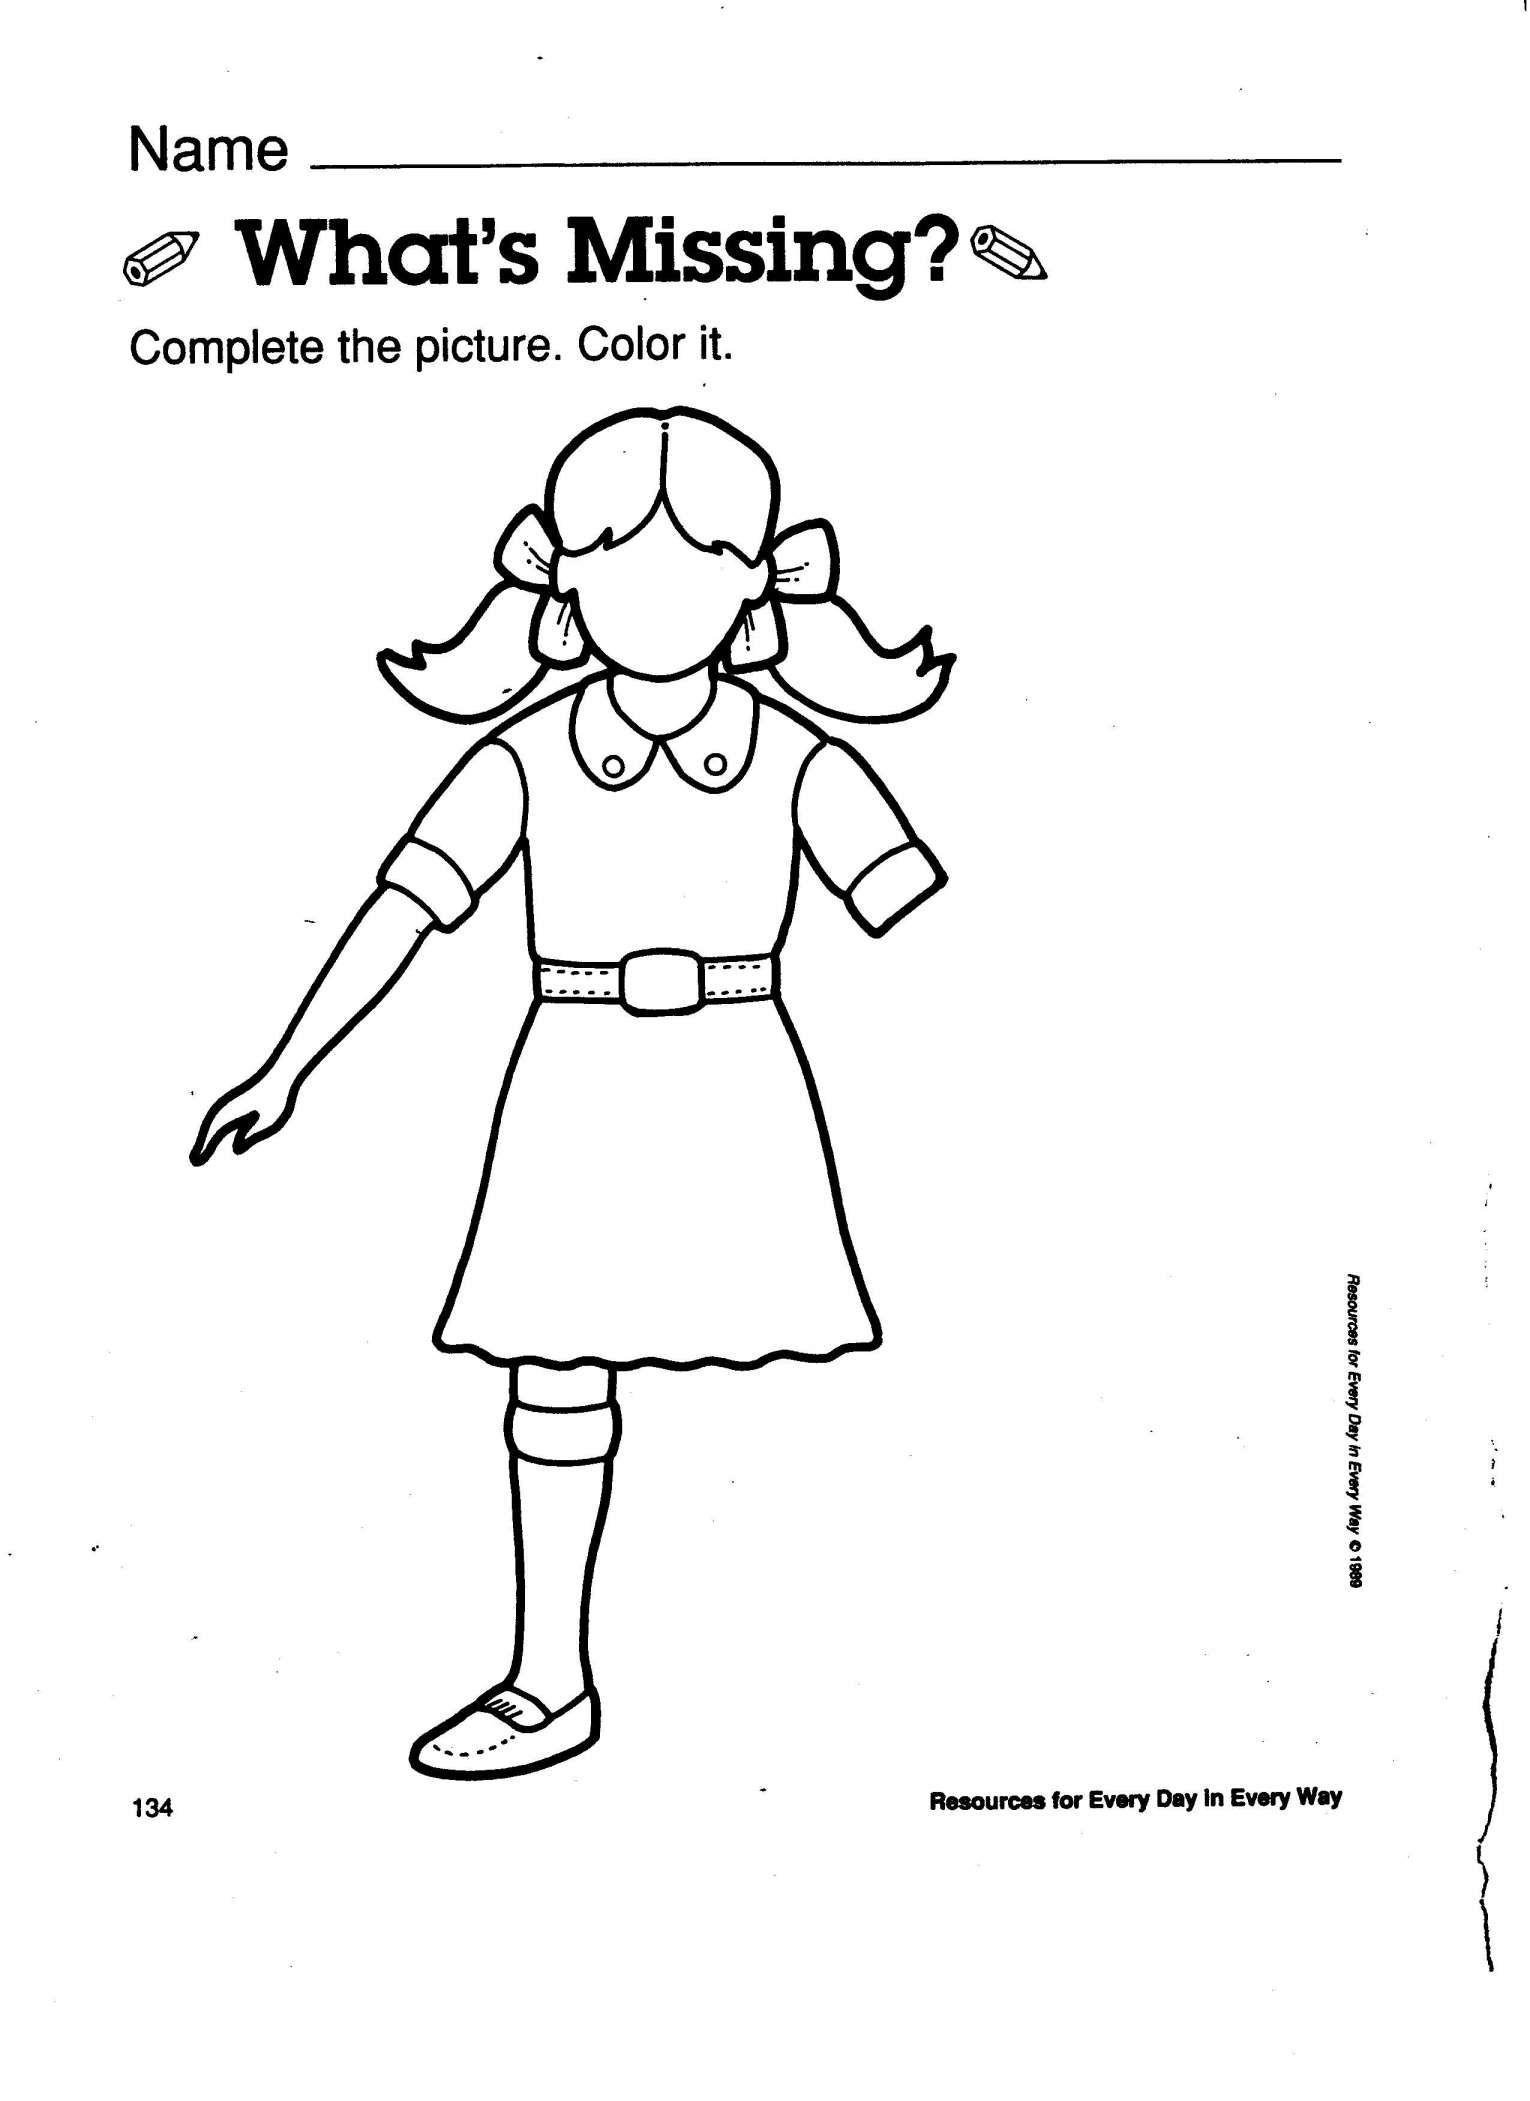 9 Missing Parts Worksheet For Preschool